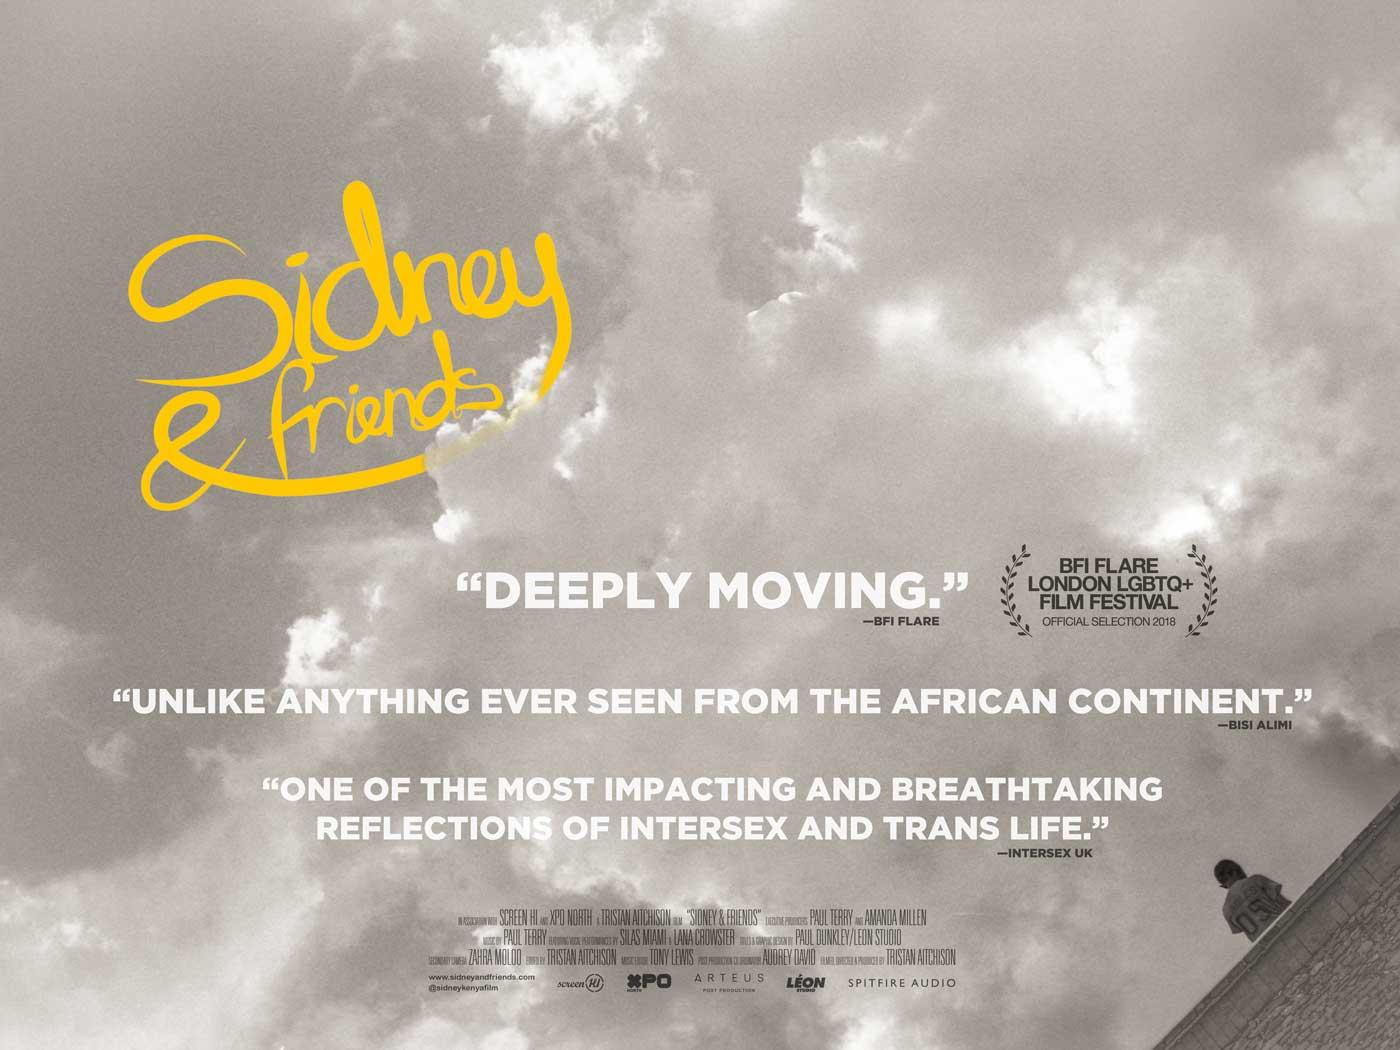 Sidney & Friends - Transforming Cinema